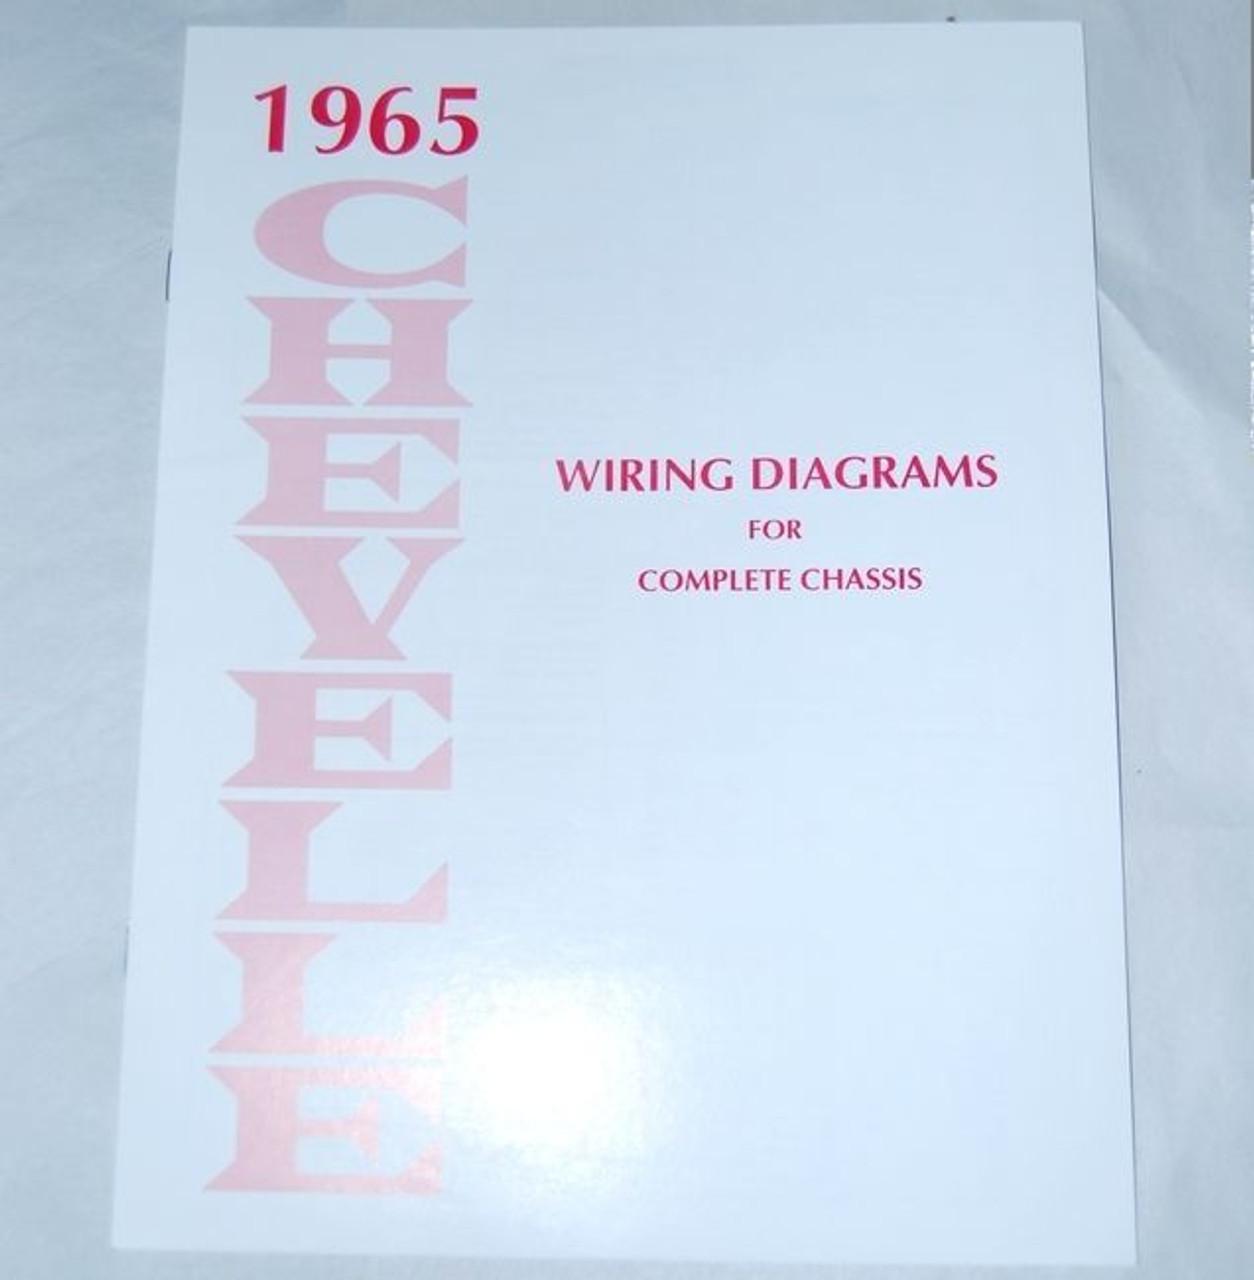 65 chevelle el camino electrical wiring diagram manual 1965 i 5 rh i5chevy com 1976 El Camino Wiring-Diagram 1976 El Camino Wiring-Diagram